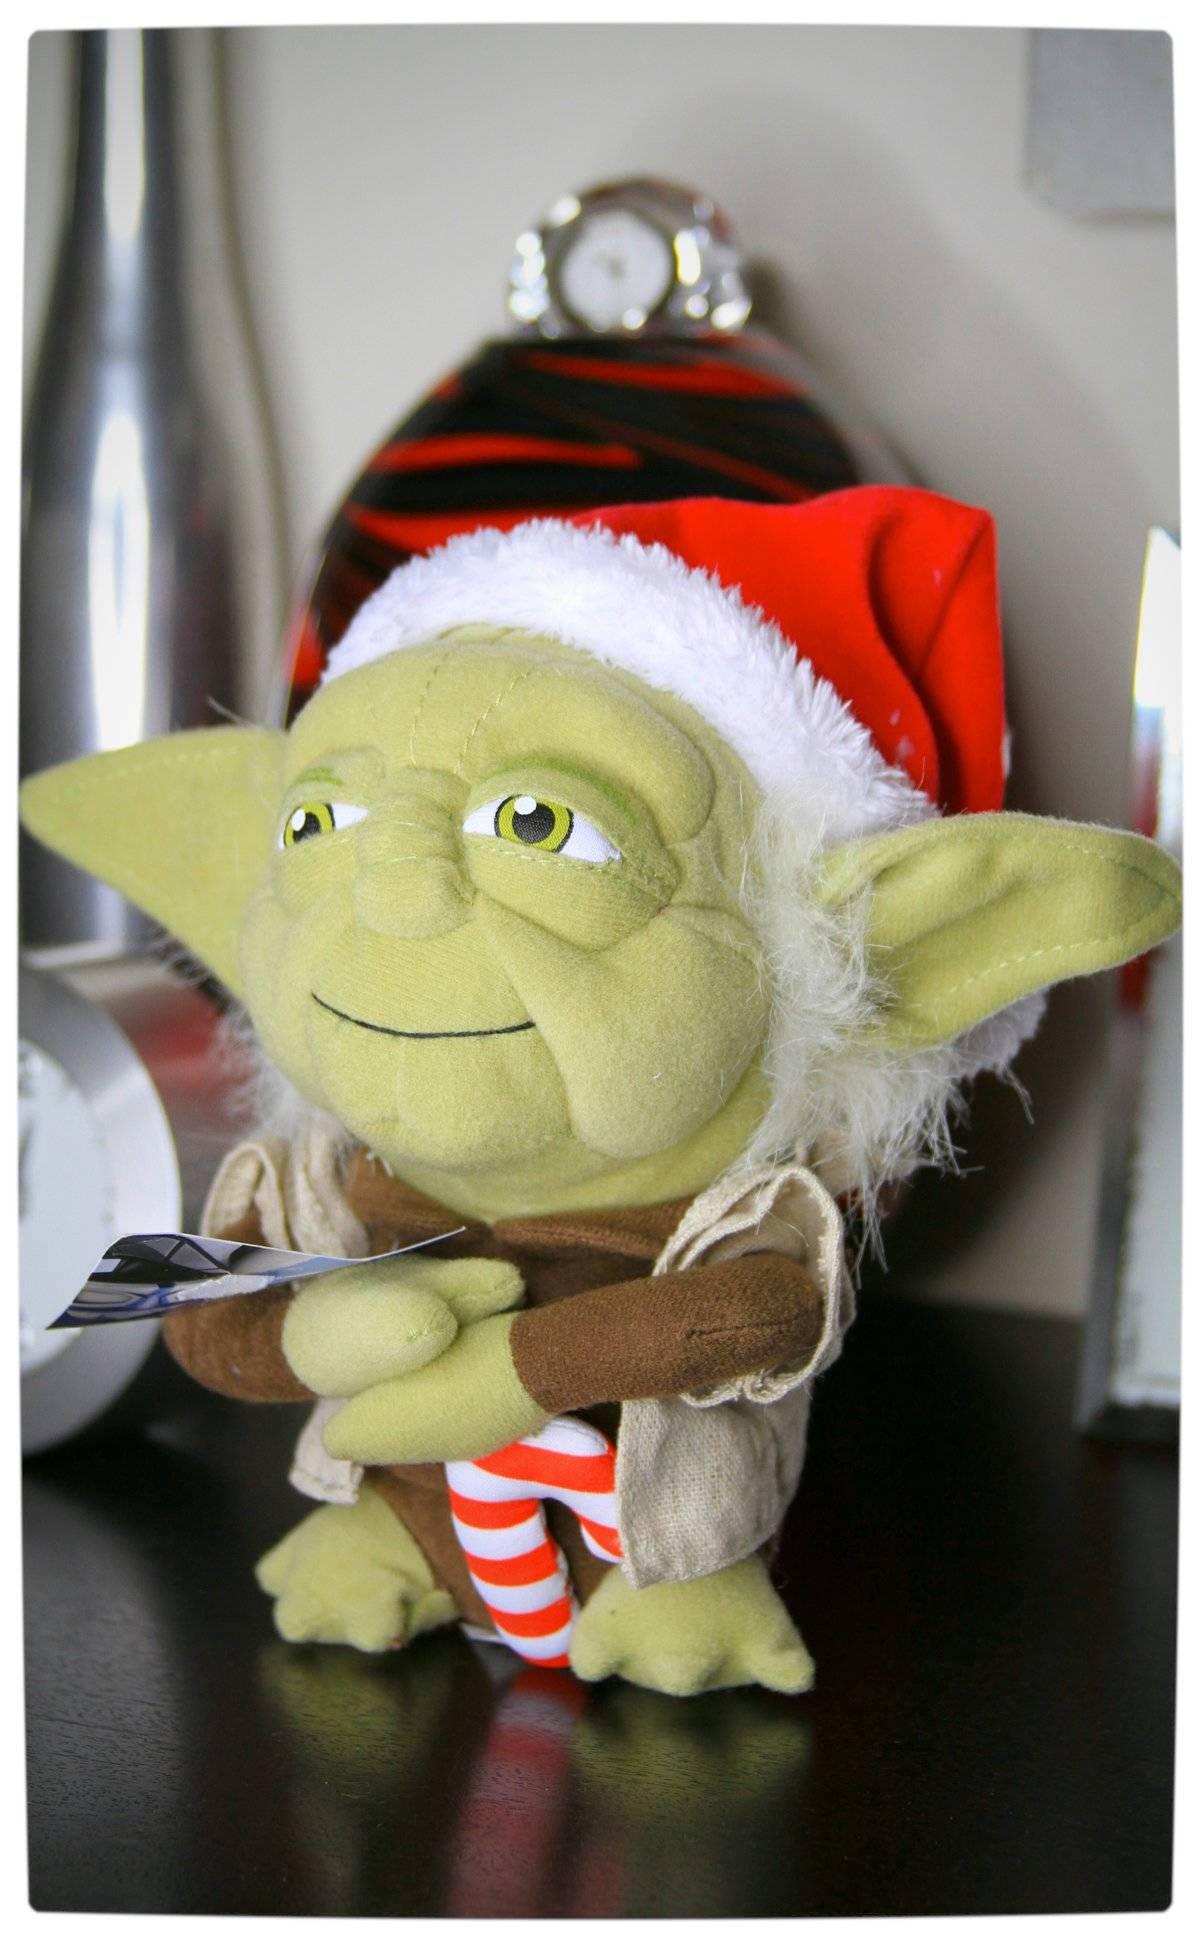 Vamers - Win With Vamers - Christmas Plushies - Star Wars Christmas Yoda Plush